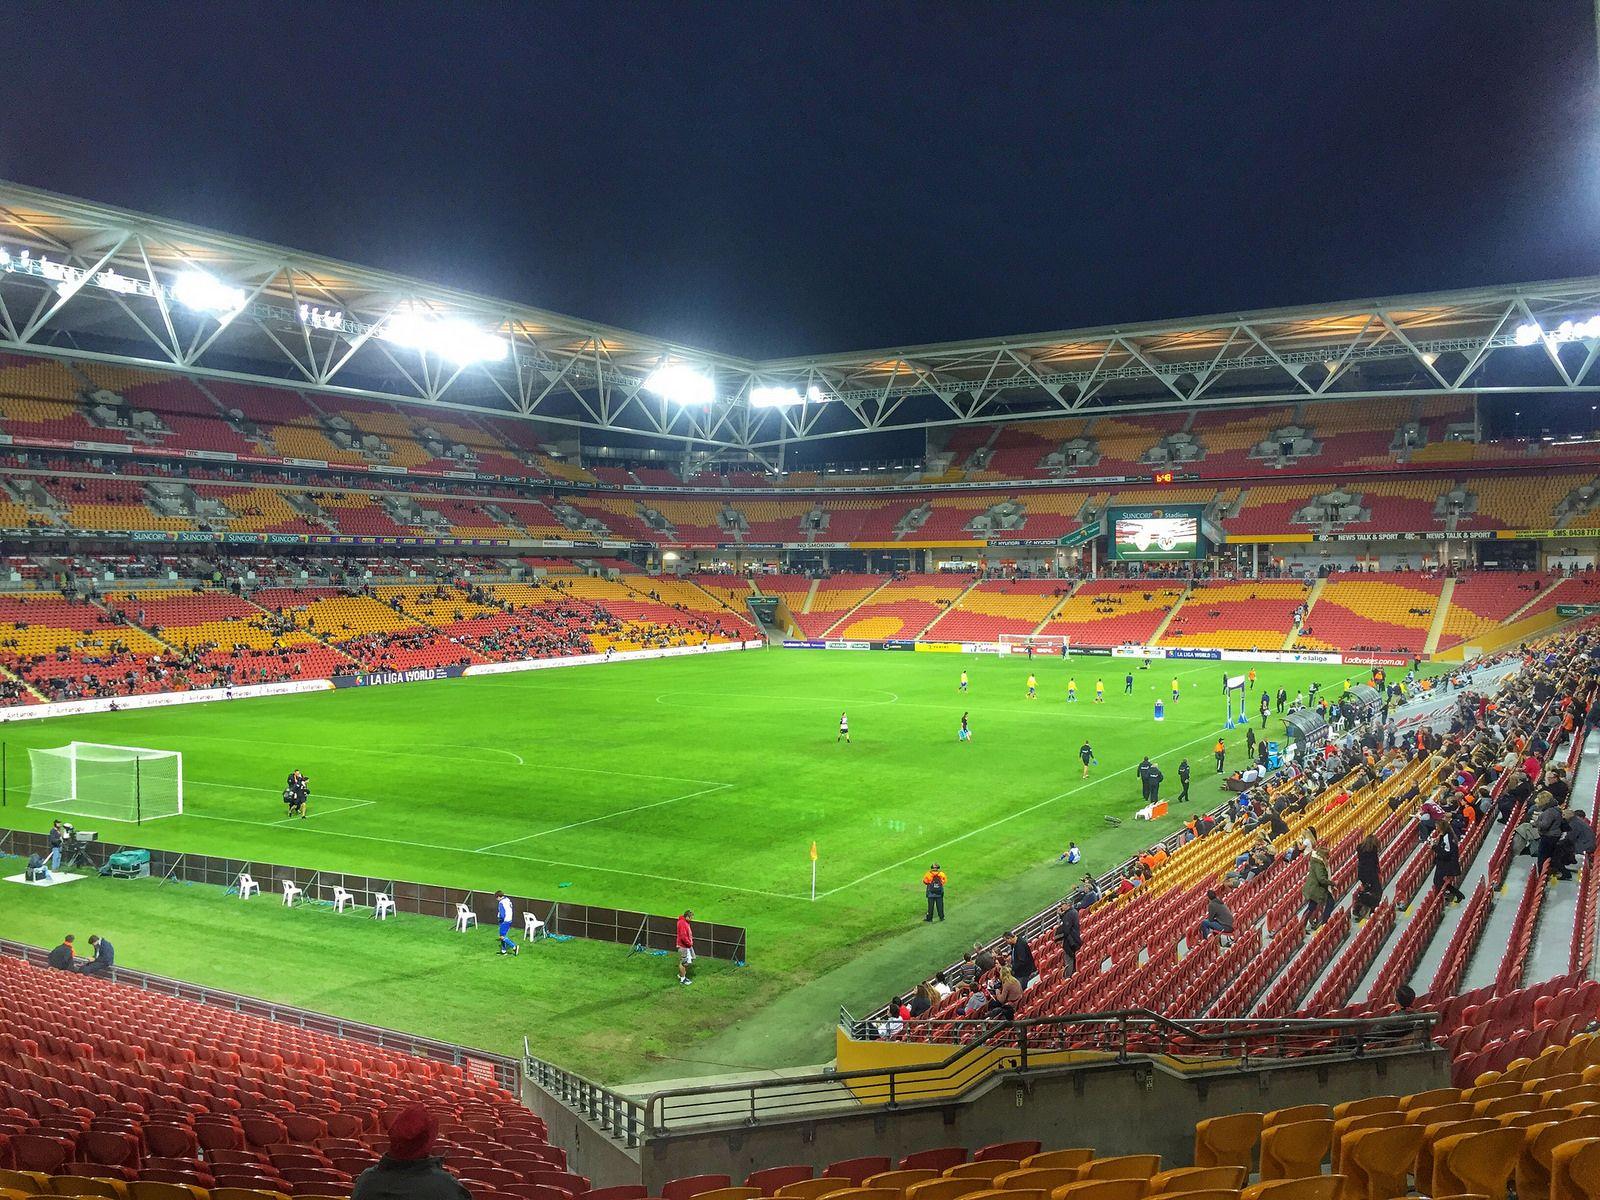 suncorp stadium - photo #31